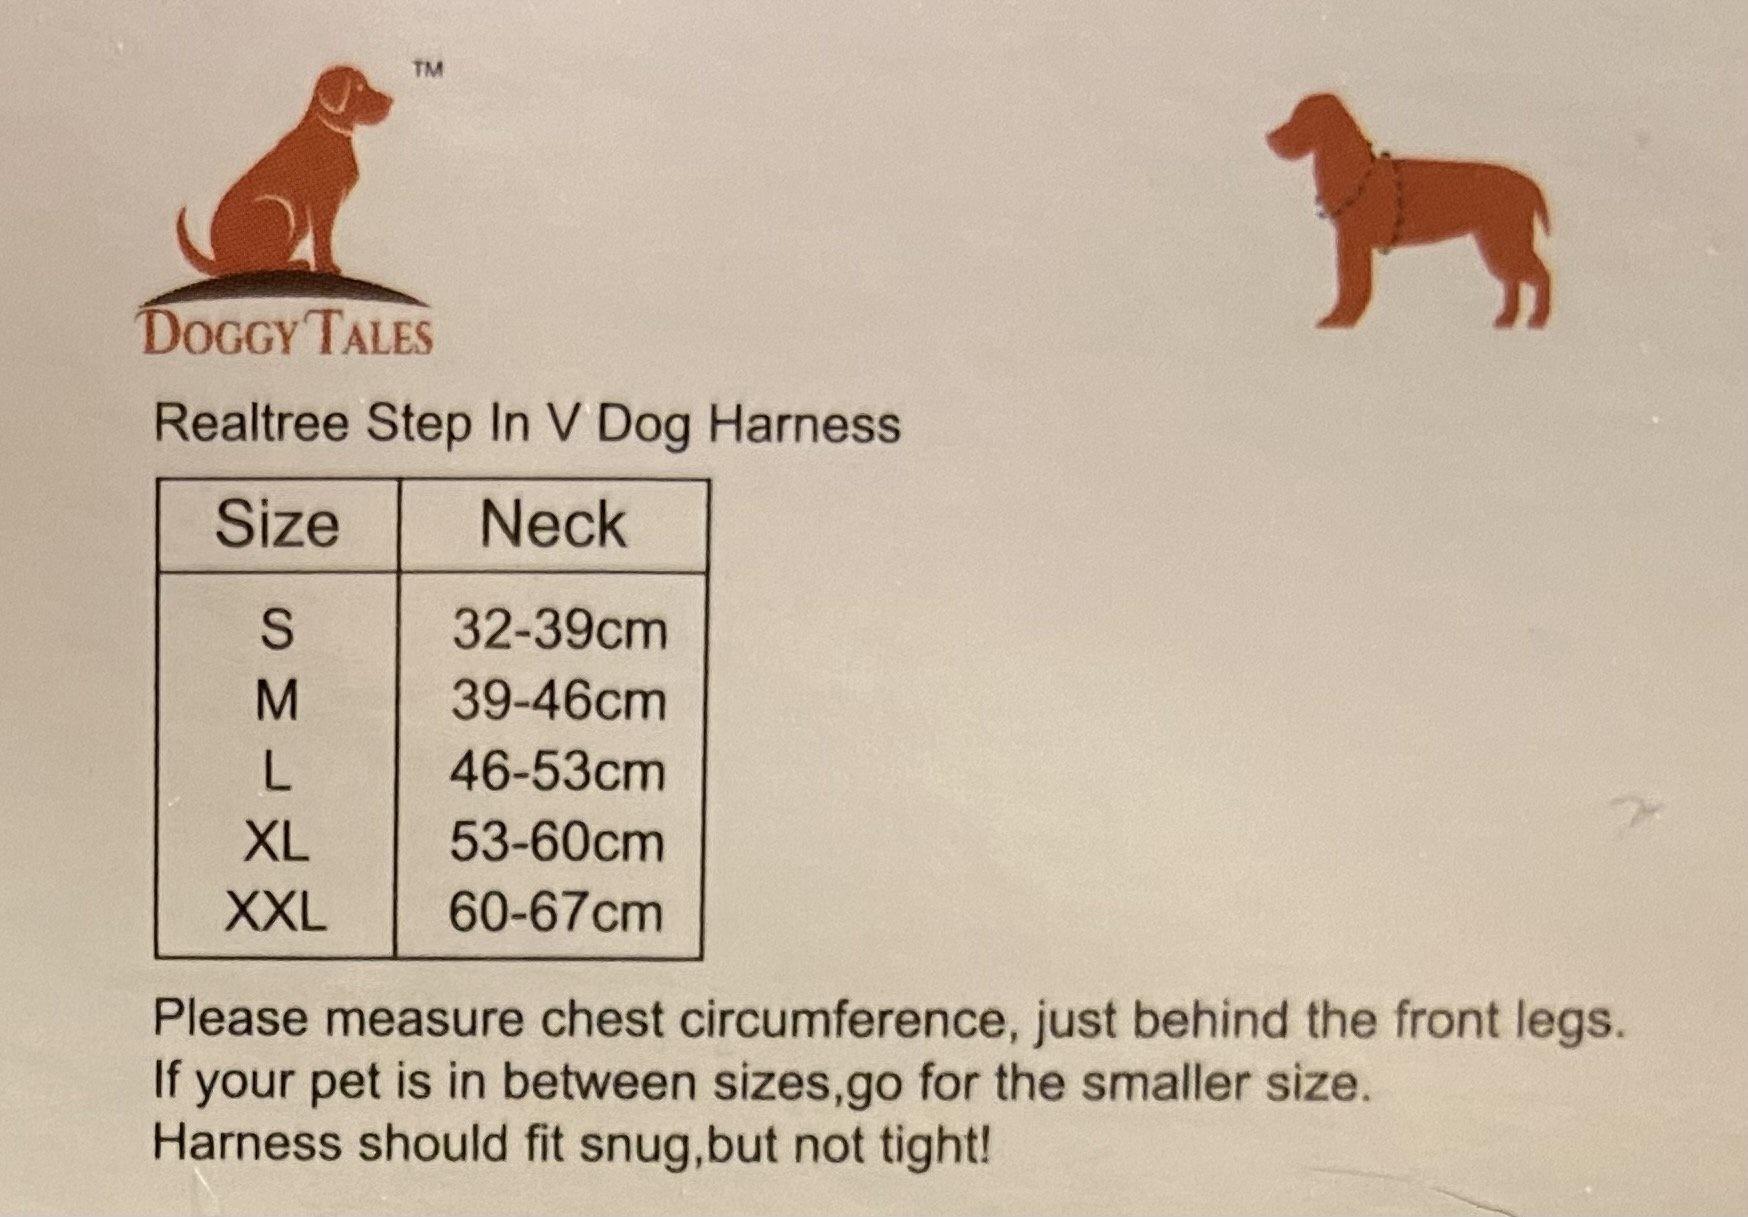 Doggy Tales Doggy Tales V Harness